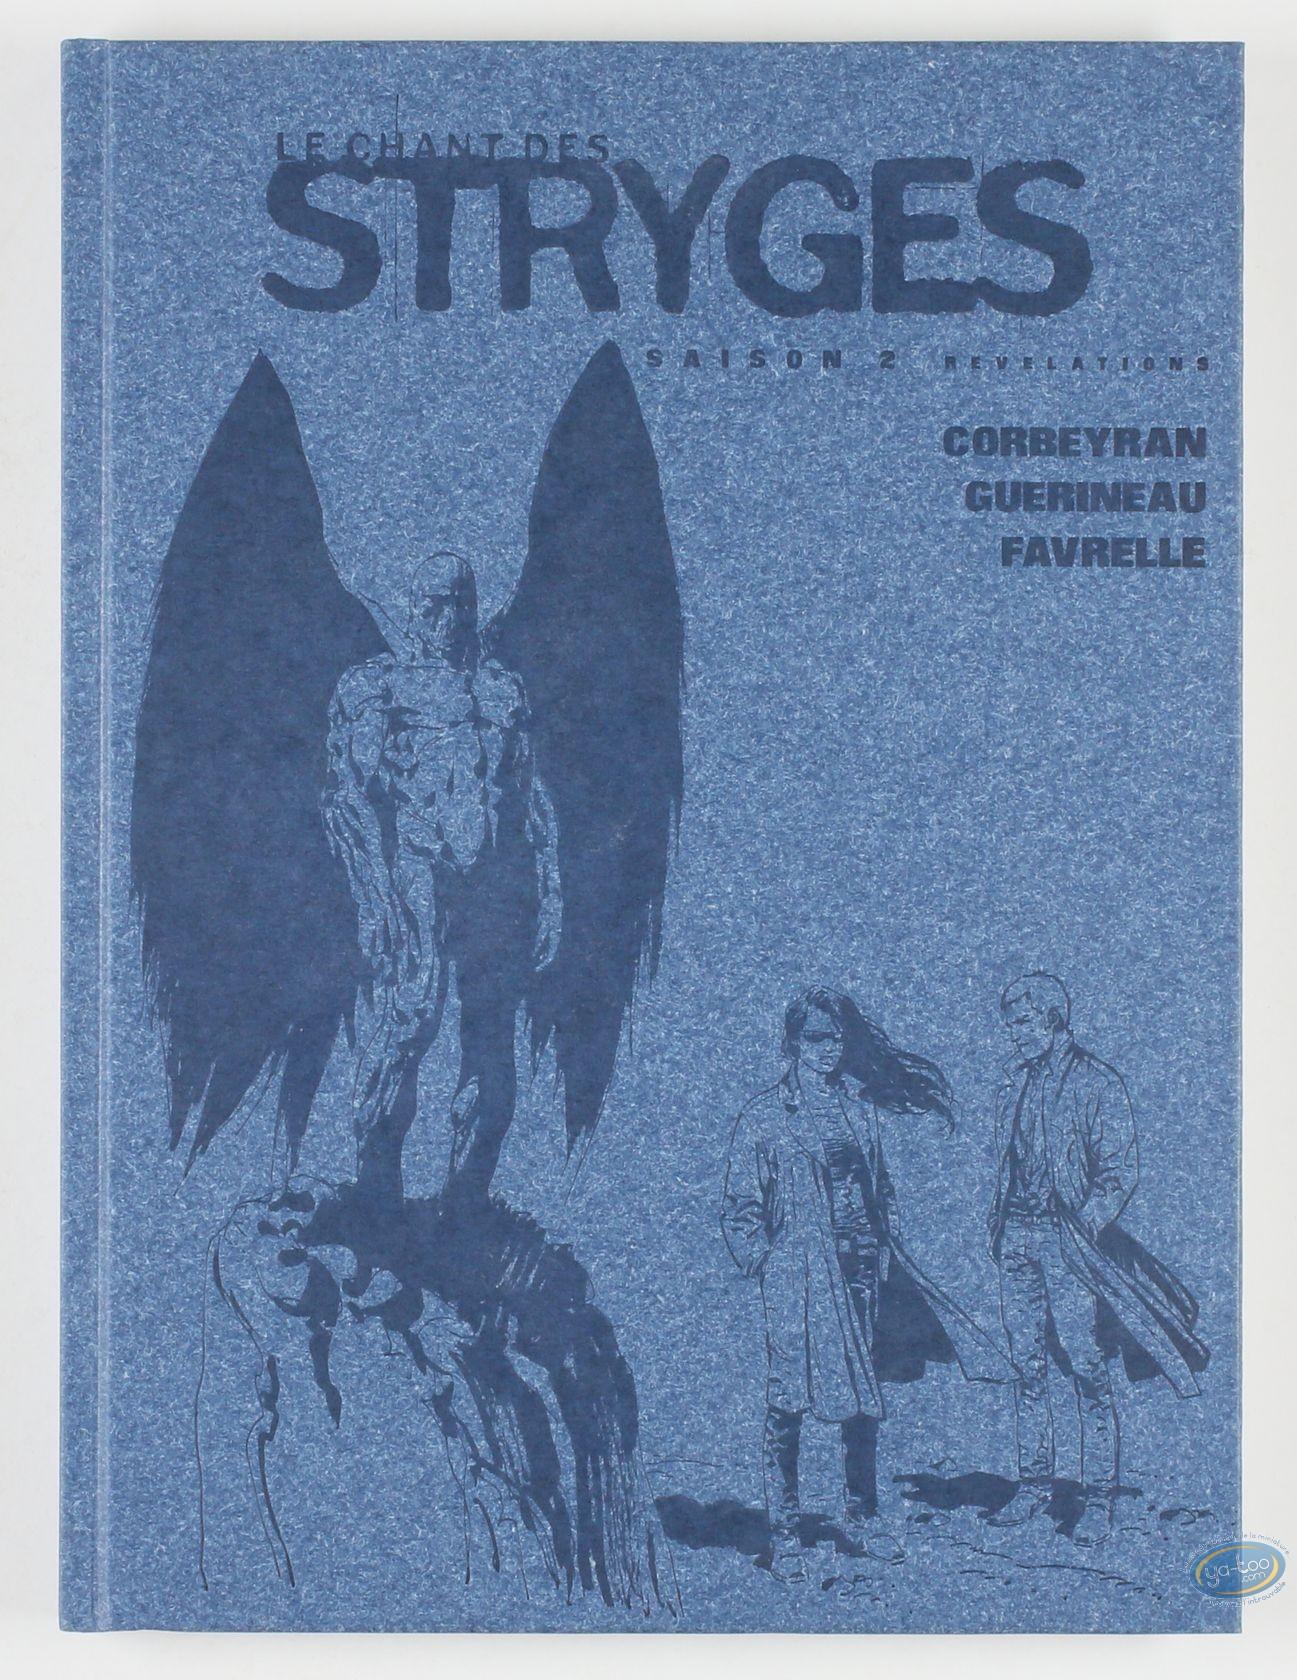 Special Edition, Chant des Stryges (Le) : Revelations